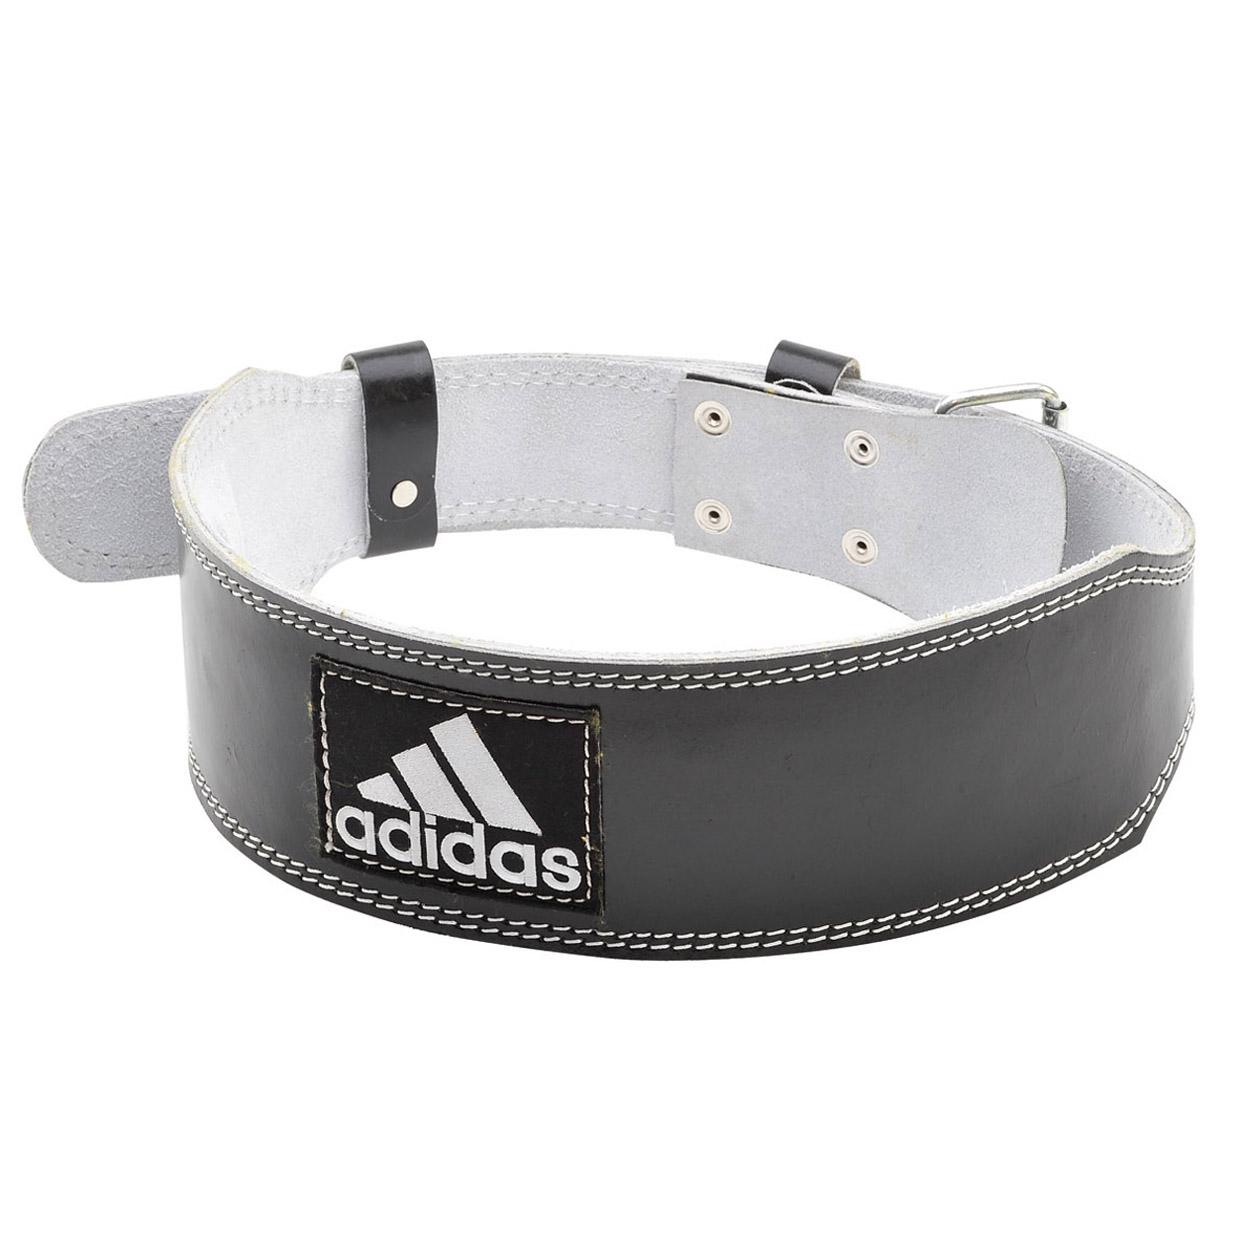 Adidas Leather Lumbar Belt - M